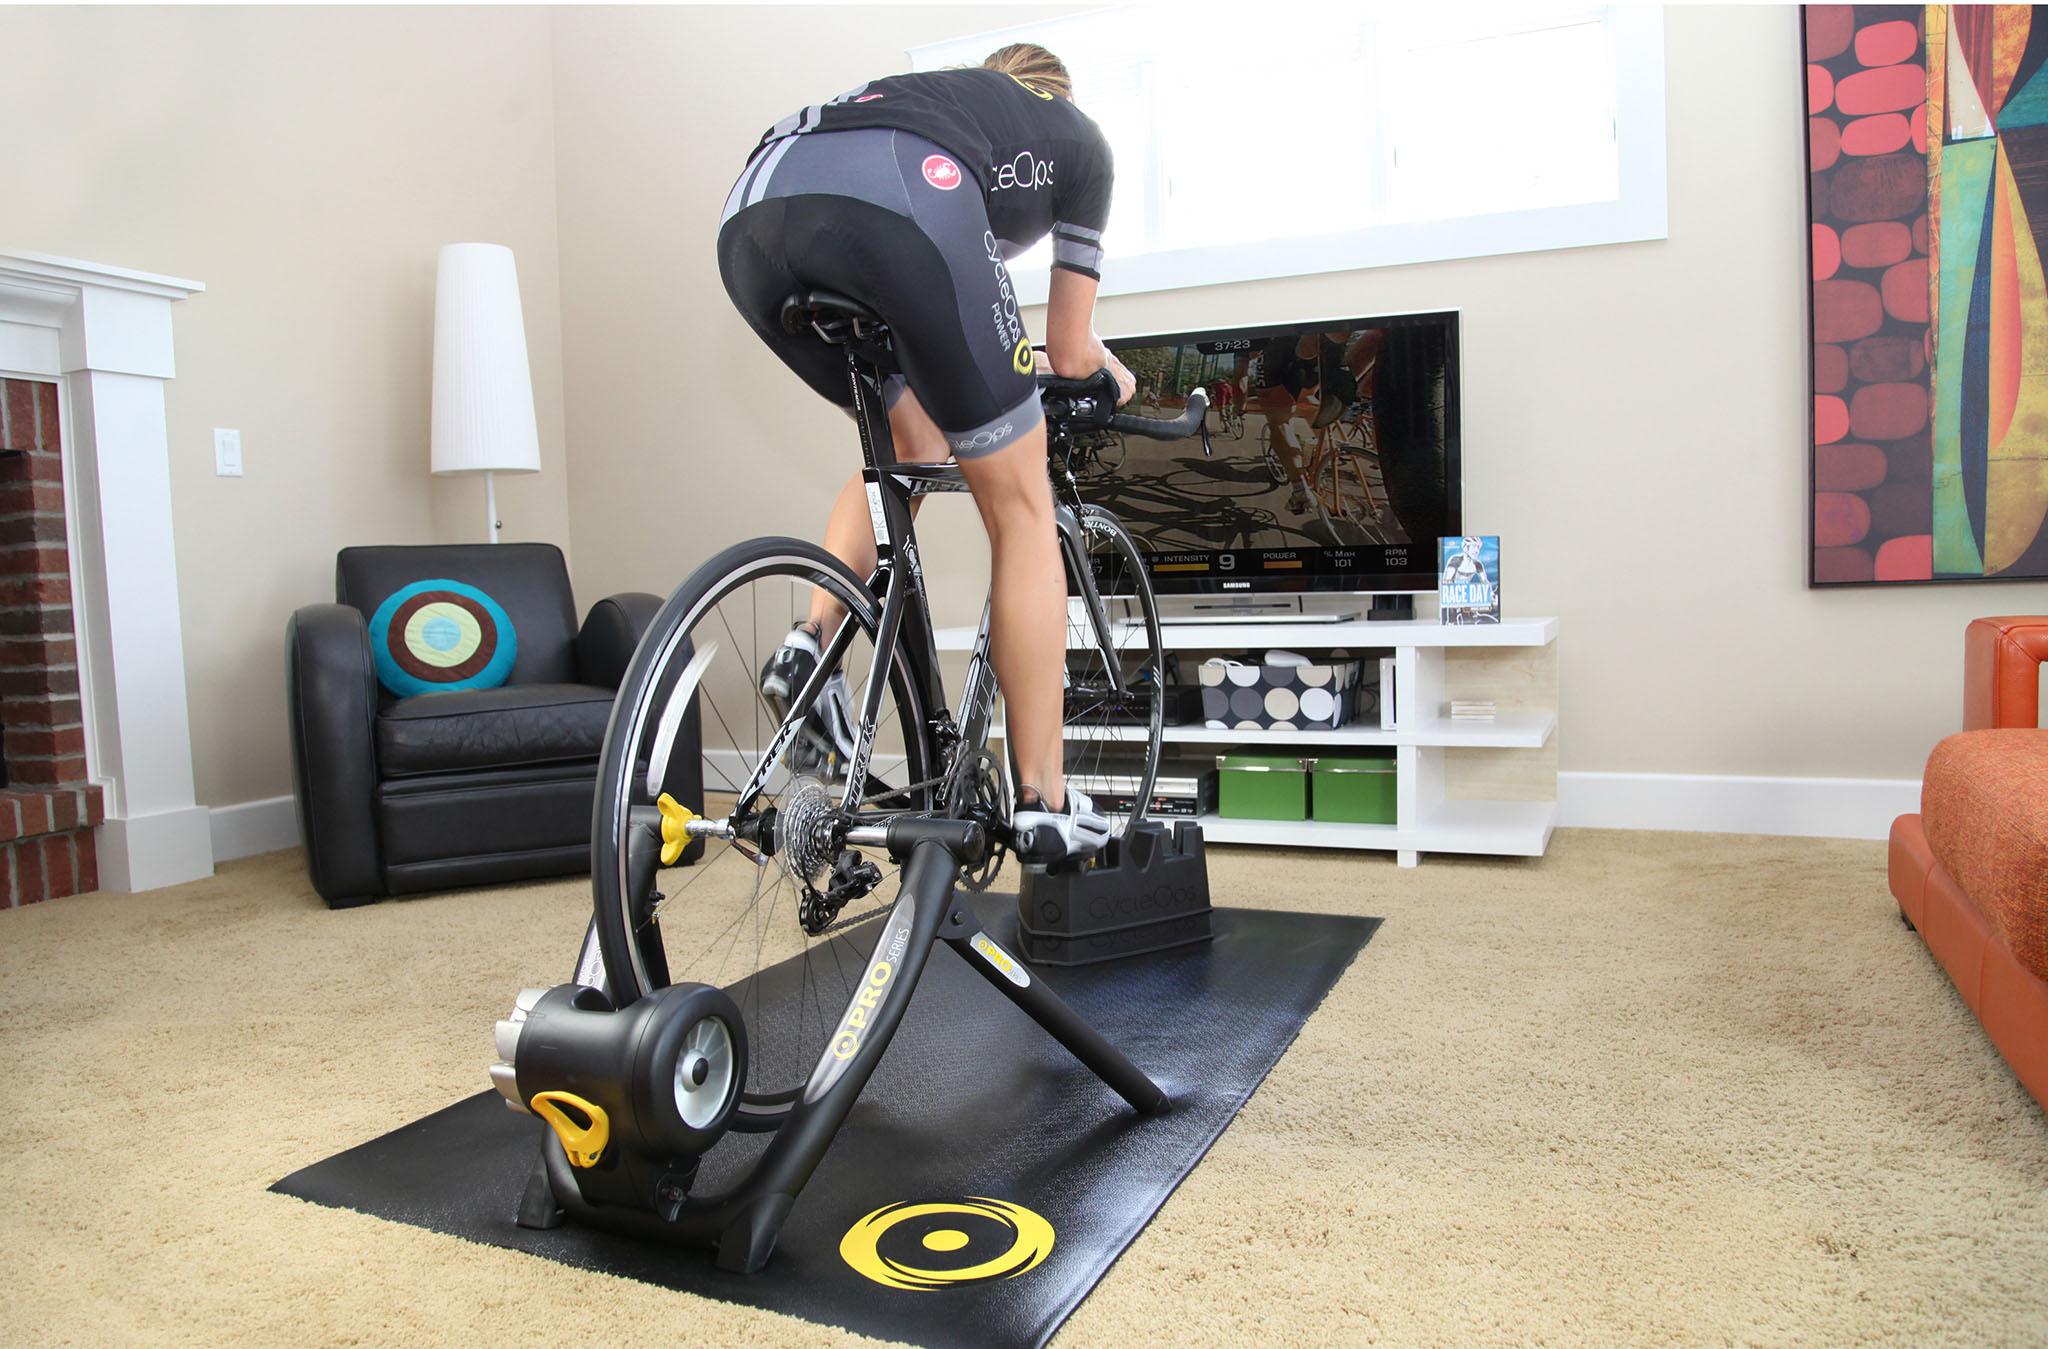 cycleops-b-jet-fluid-pro-turbo-trainer-winter-training-kit